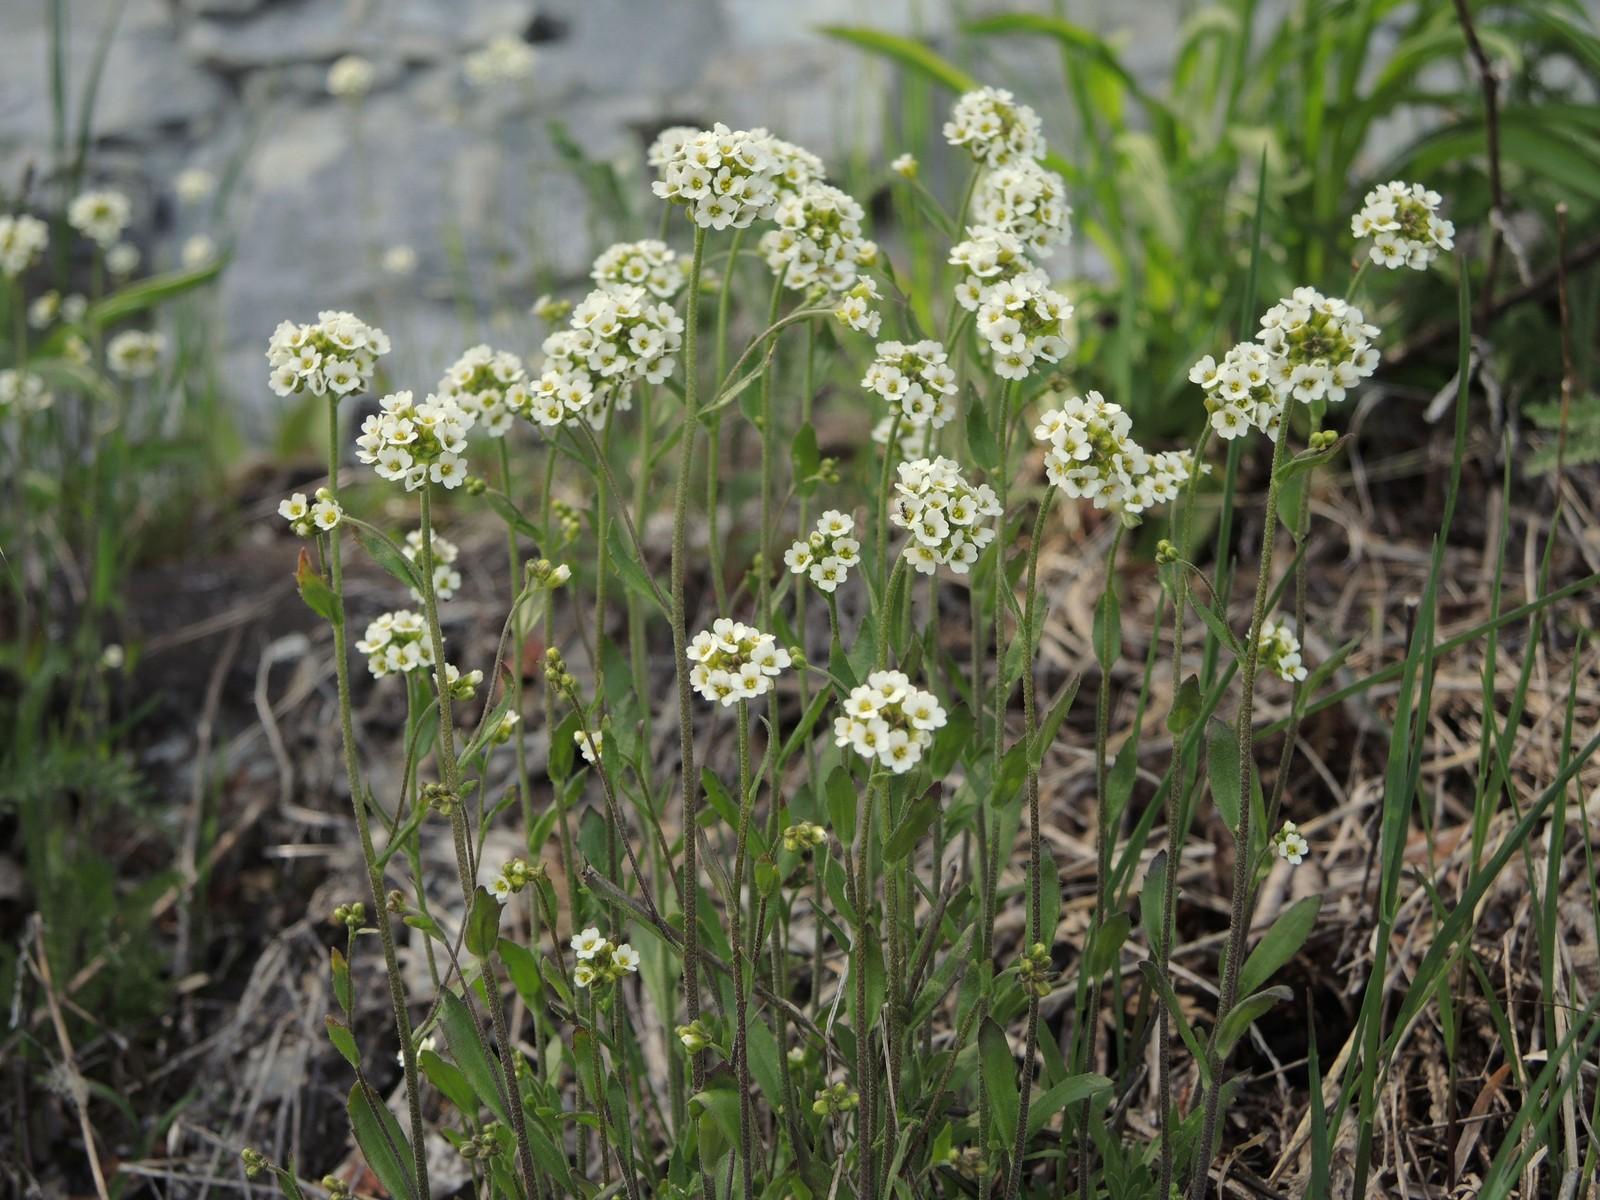 201405291538003 Lyre Leaved Rock Cress Arabis Lyrata White Flowers